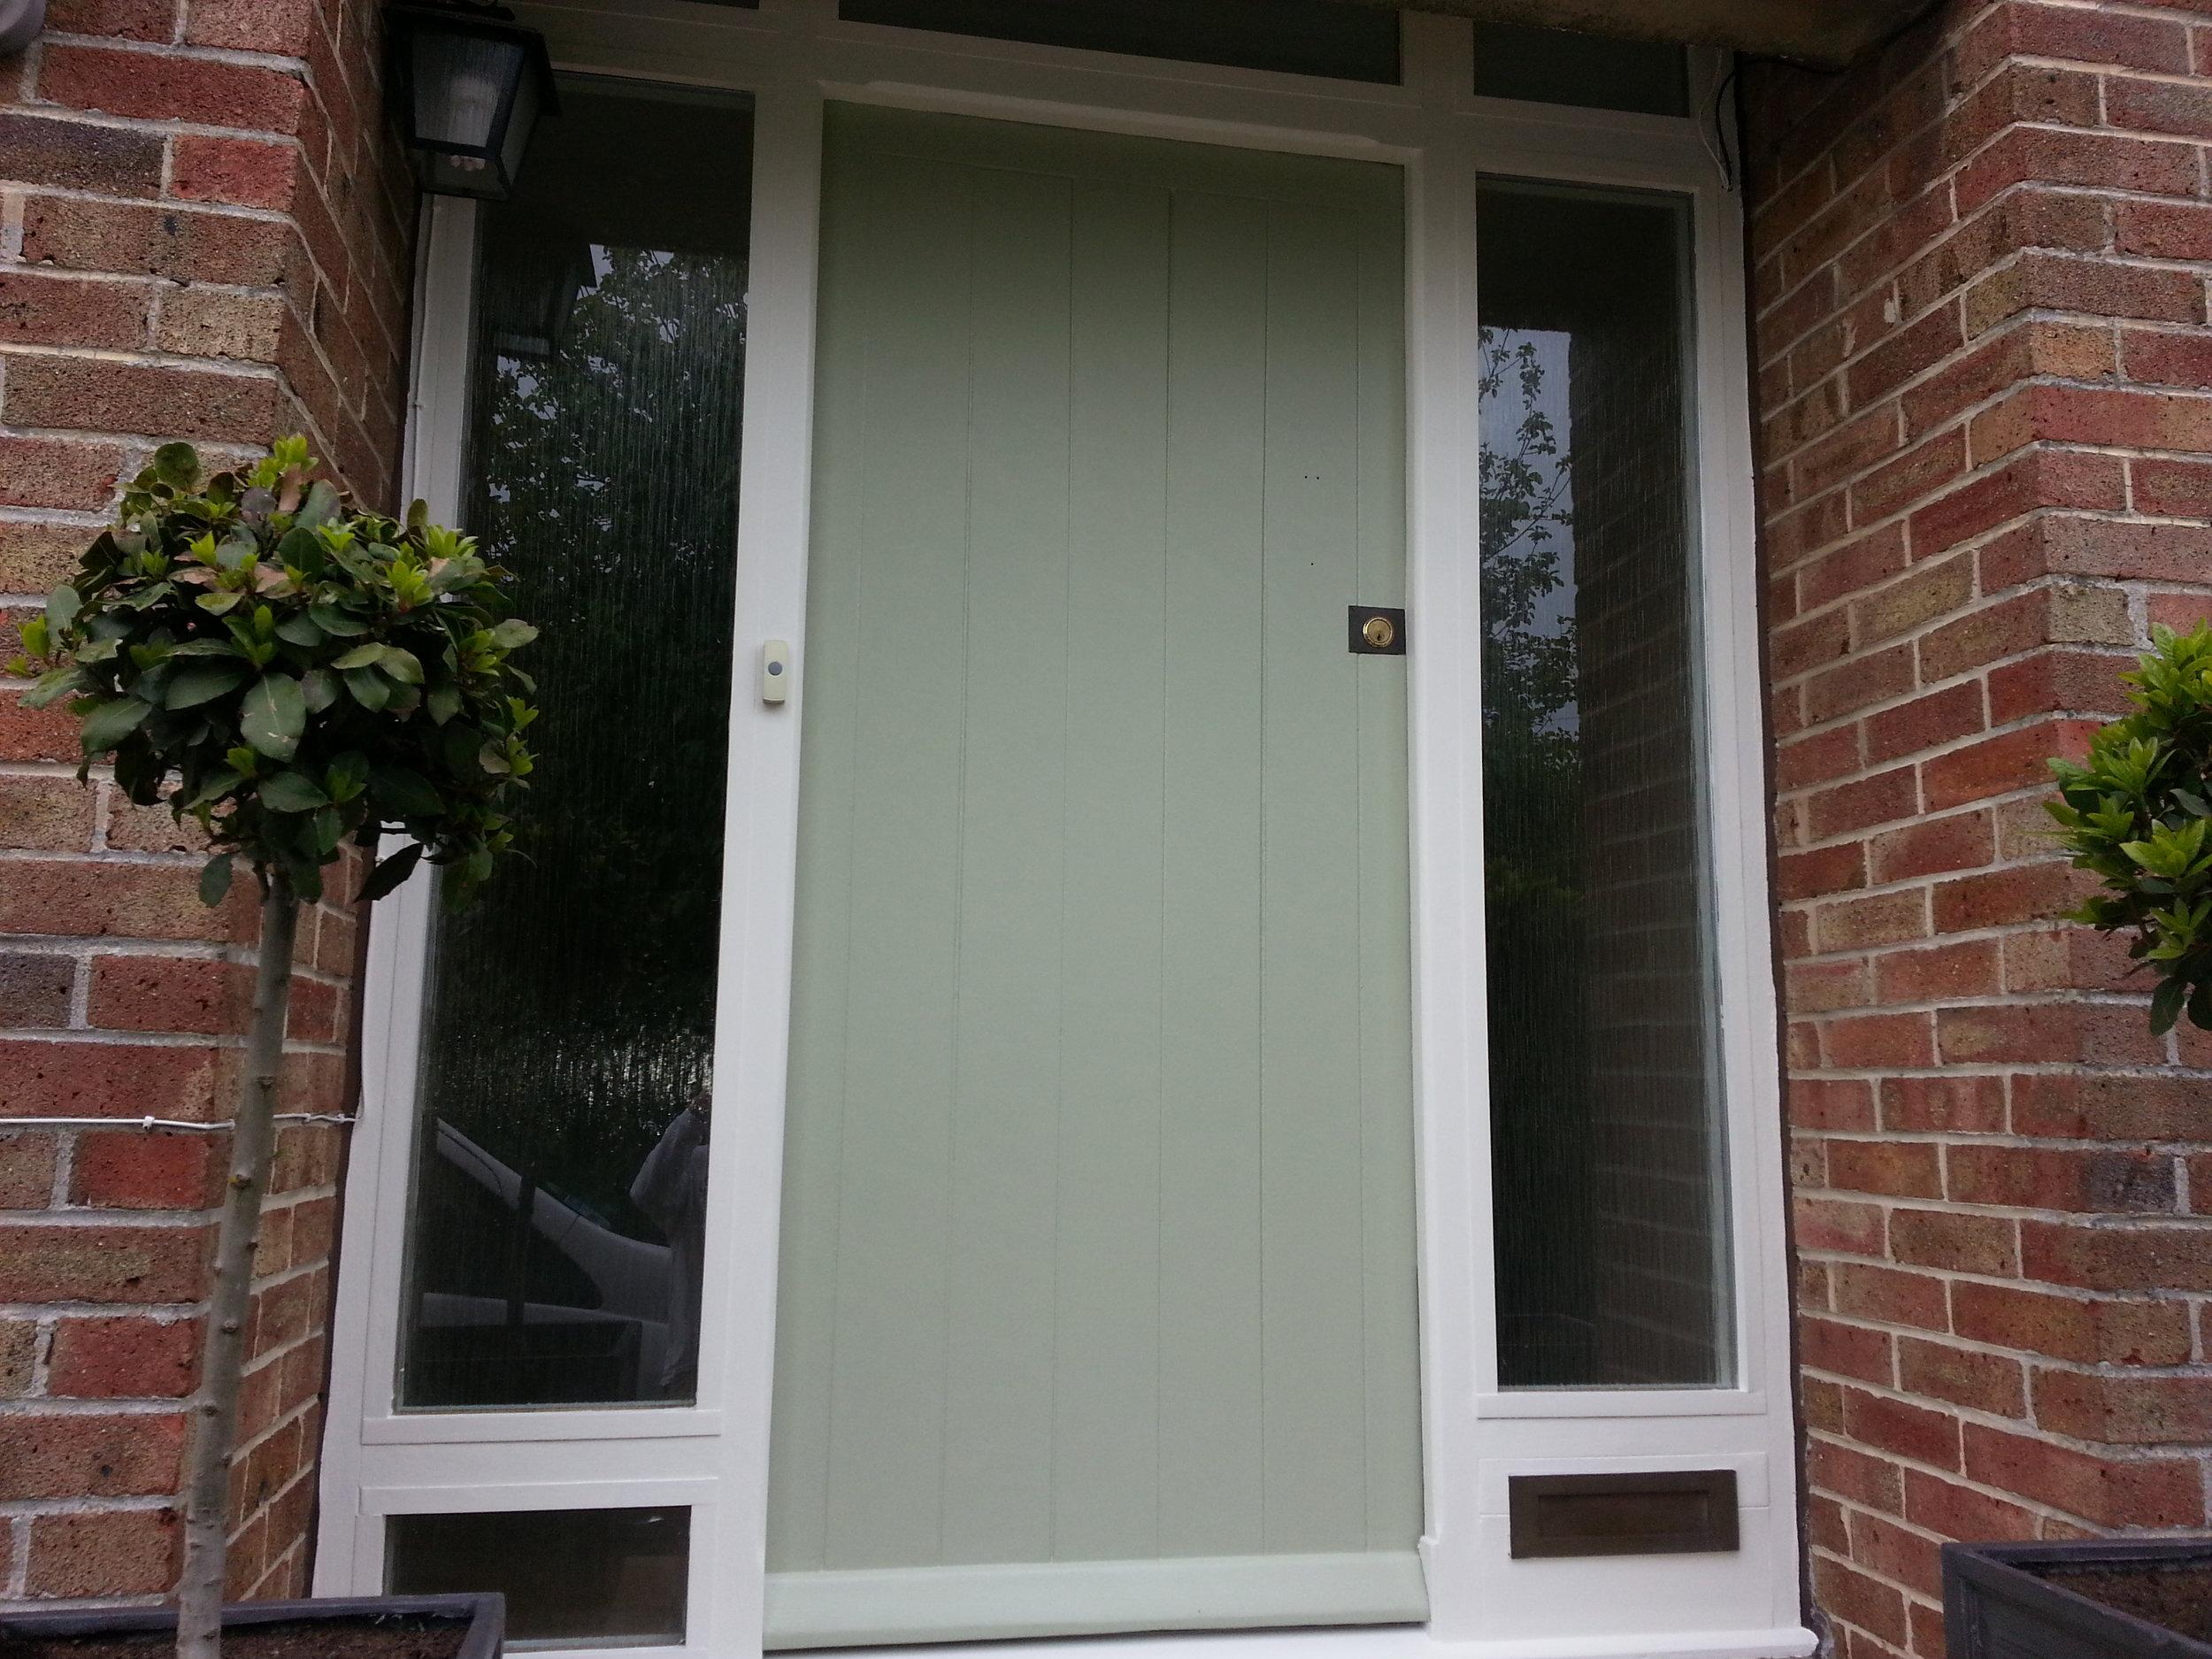 Exterior front door decoration in Royal Wootton Bassett, Swindon, Wiltshire